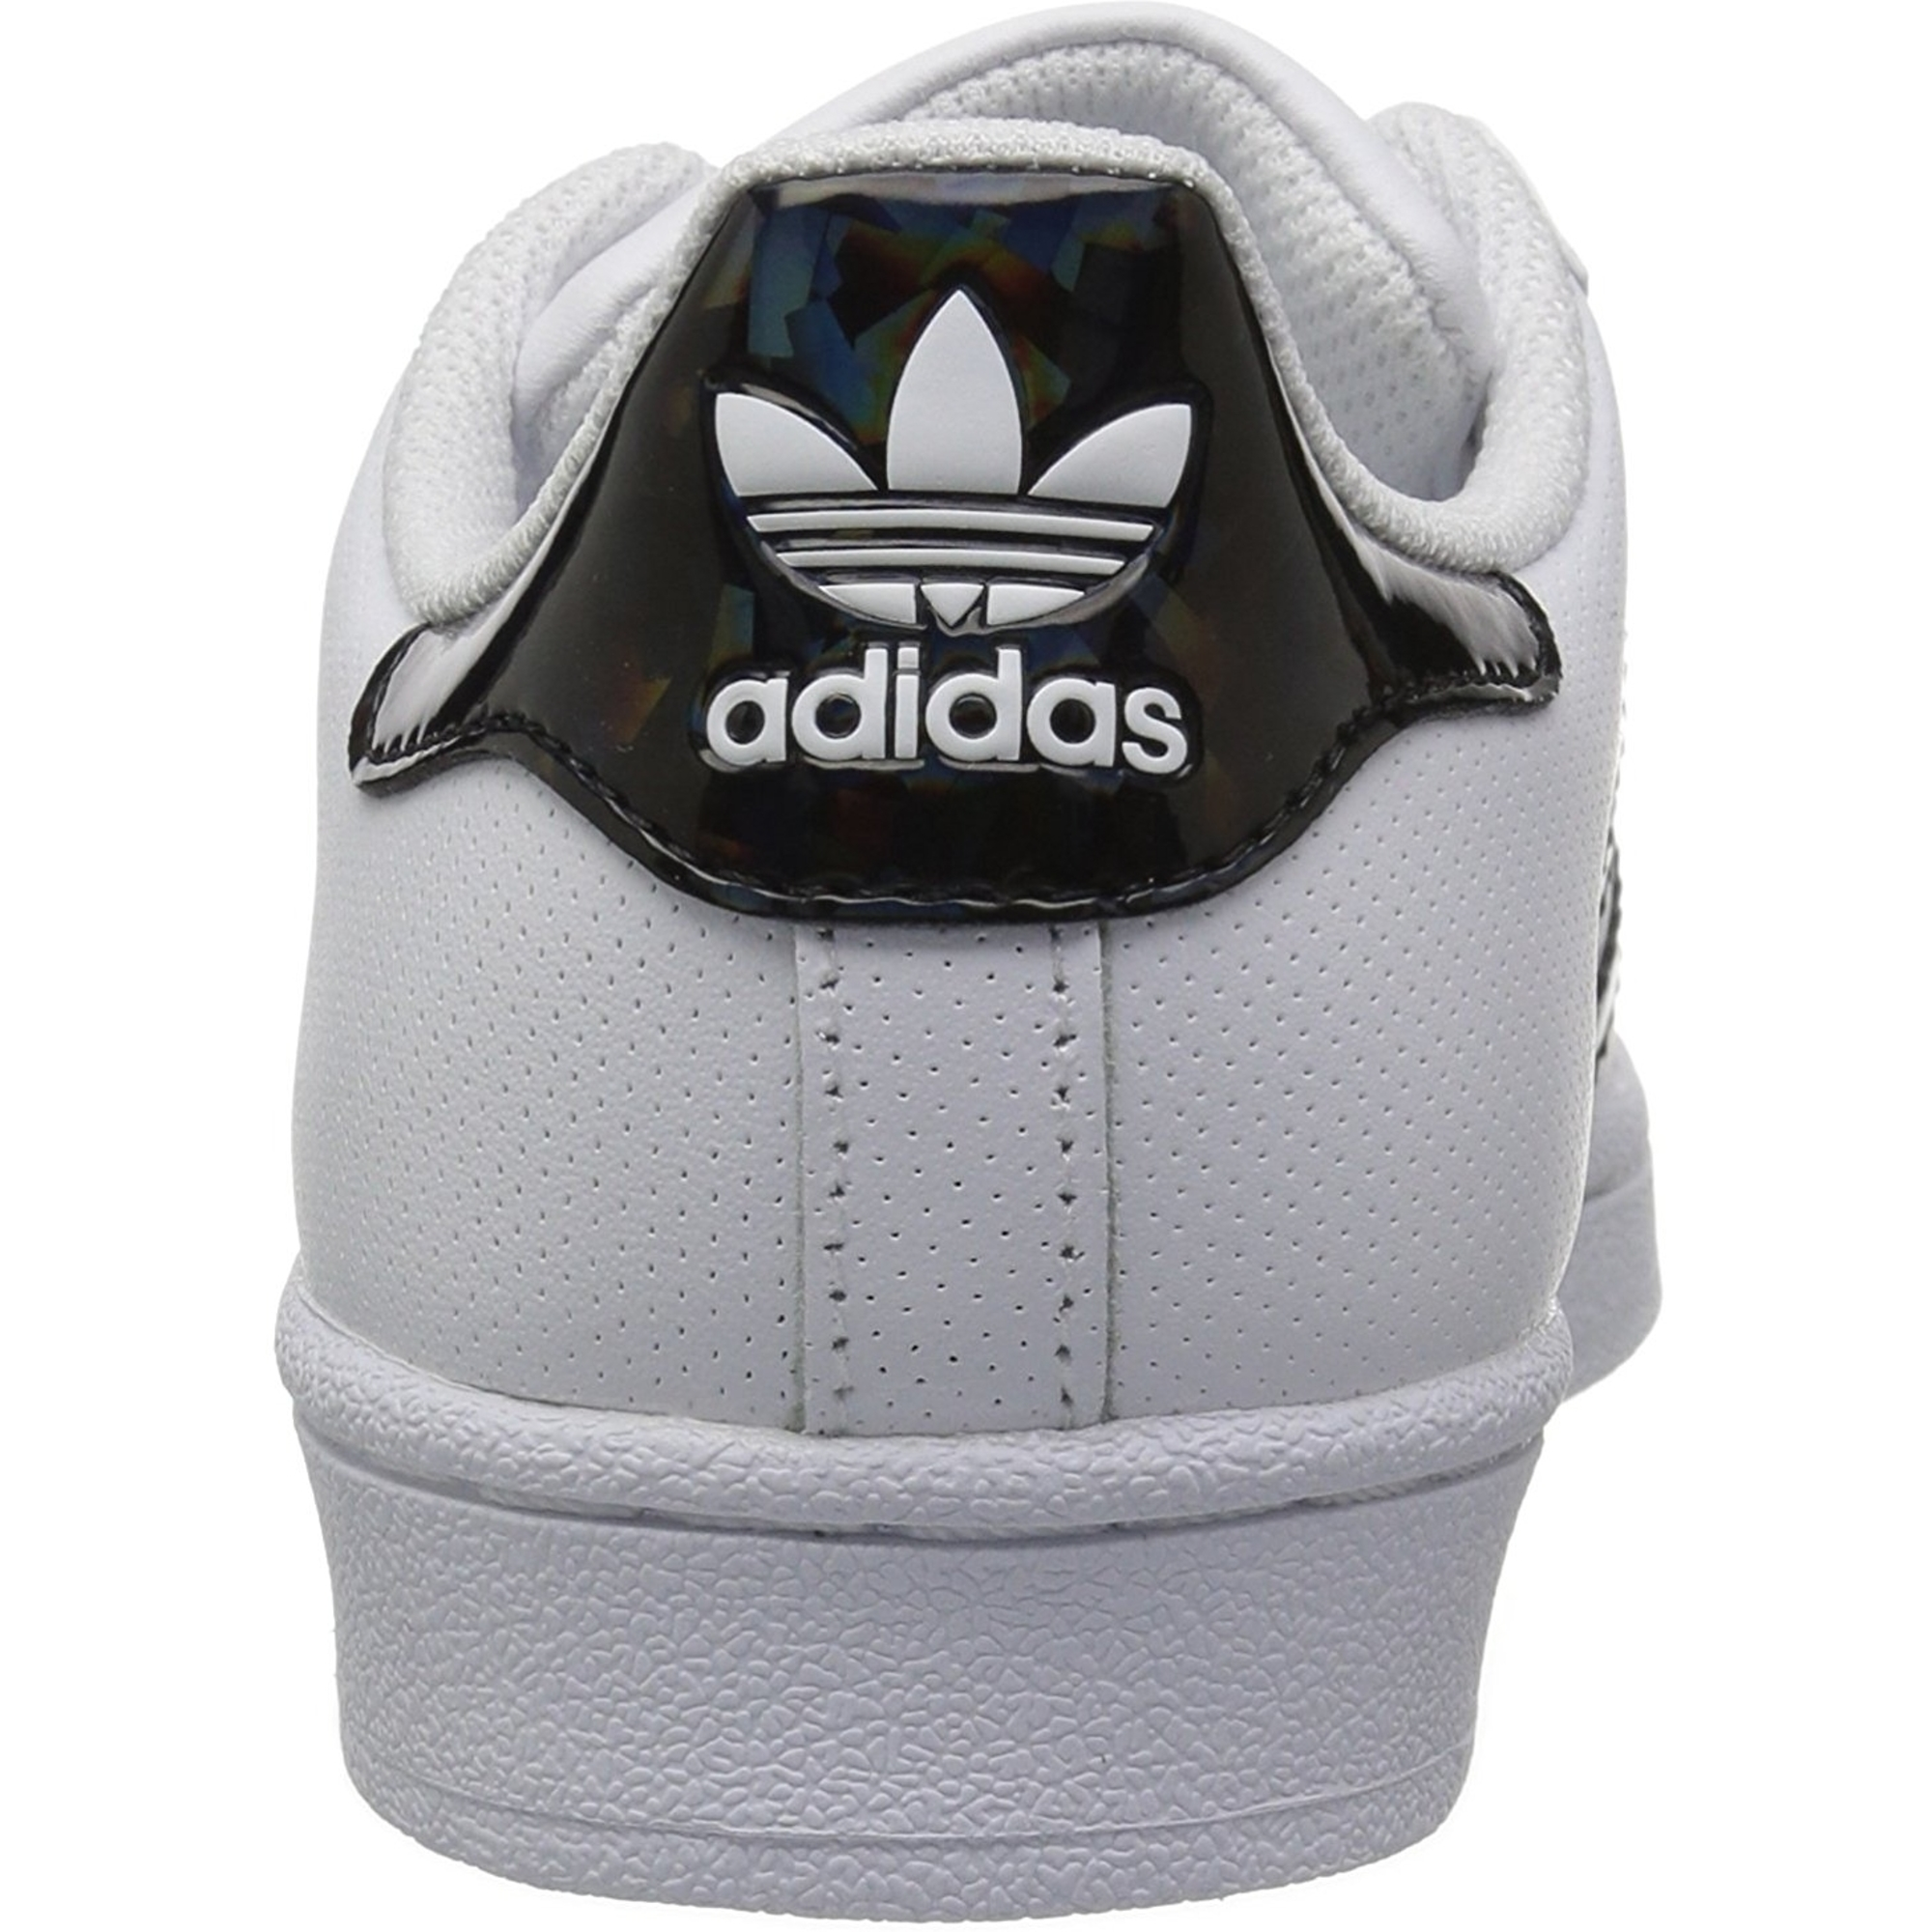 adidas Originals Superstar J BlancHolographique Noir Cuir Jeunesse